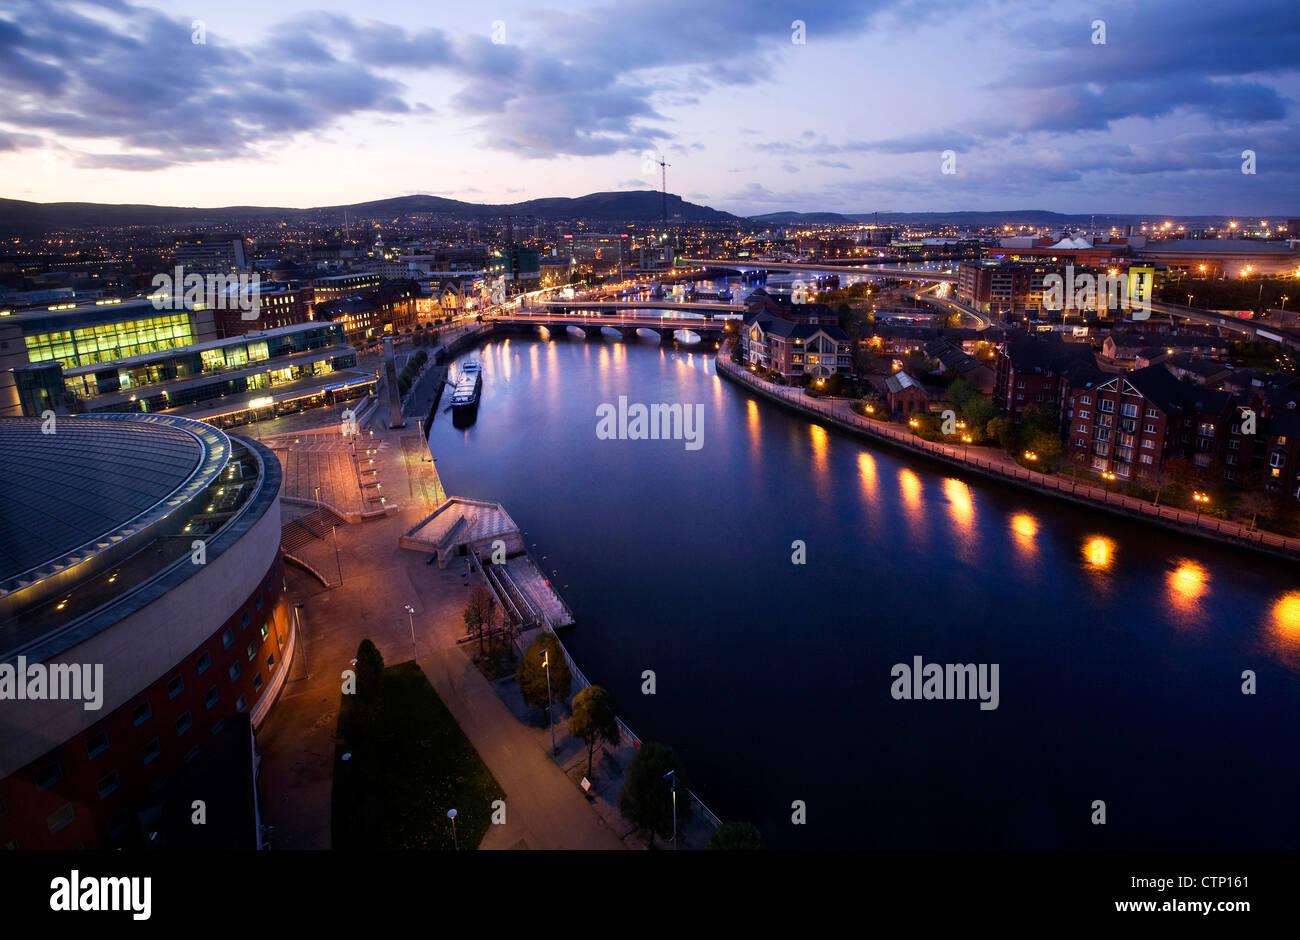 Dusk view over Belfast, Northern Ireland - Stock Image